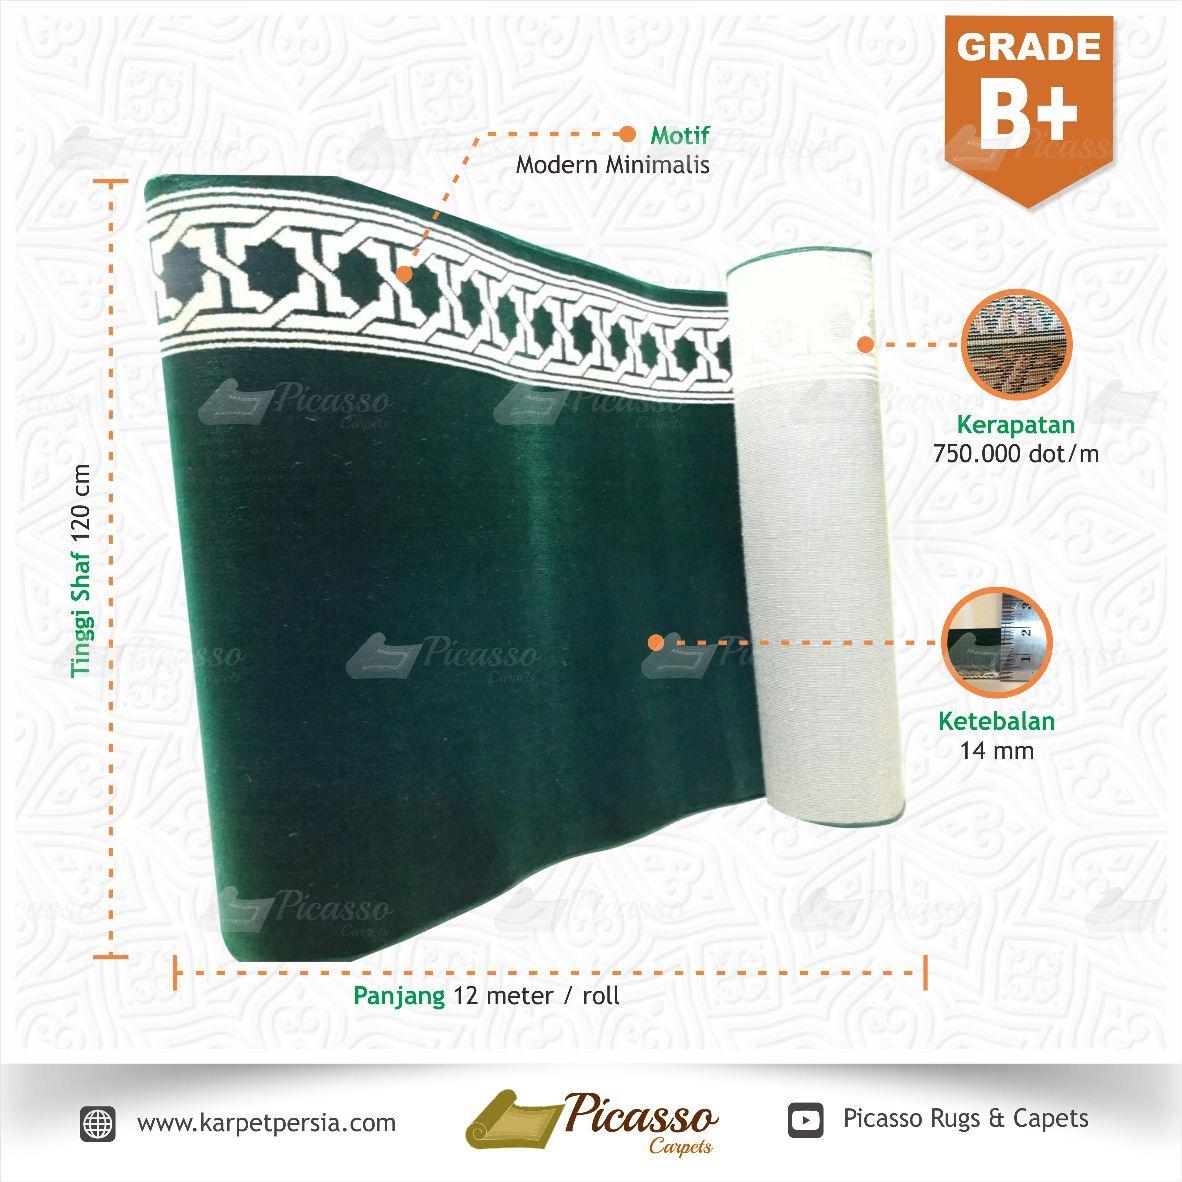 Karpet Masjid - Grade B+